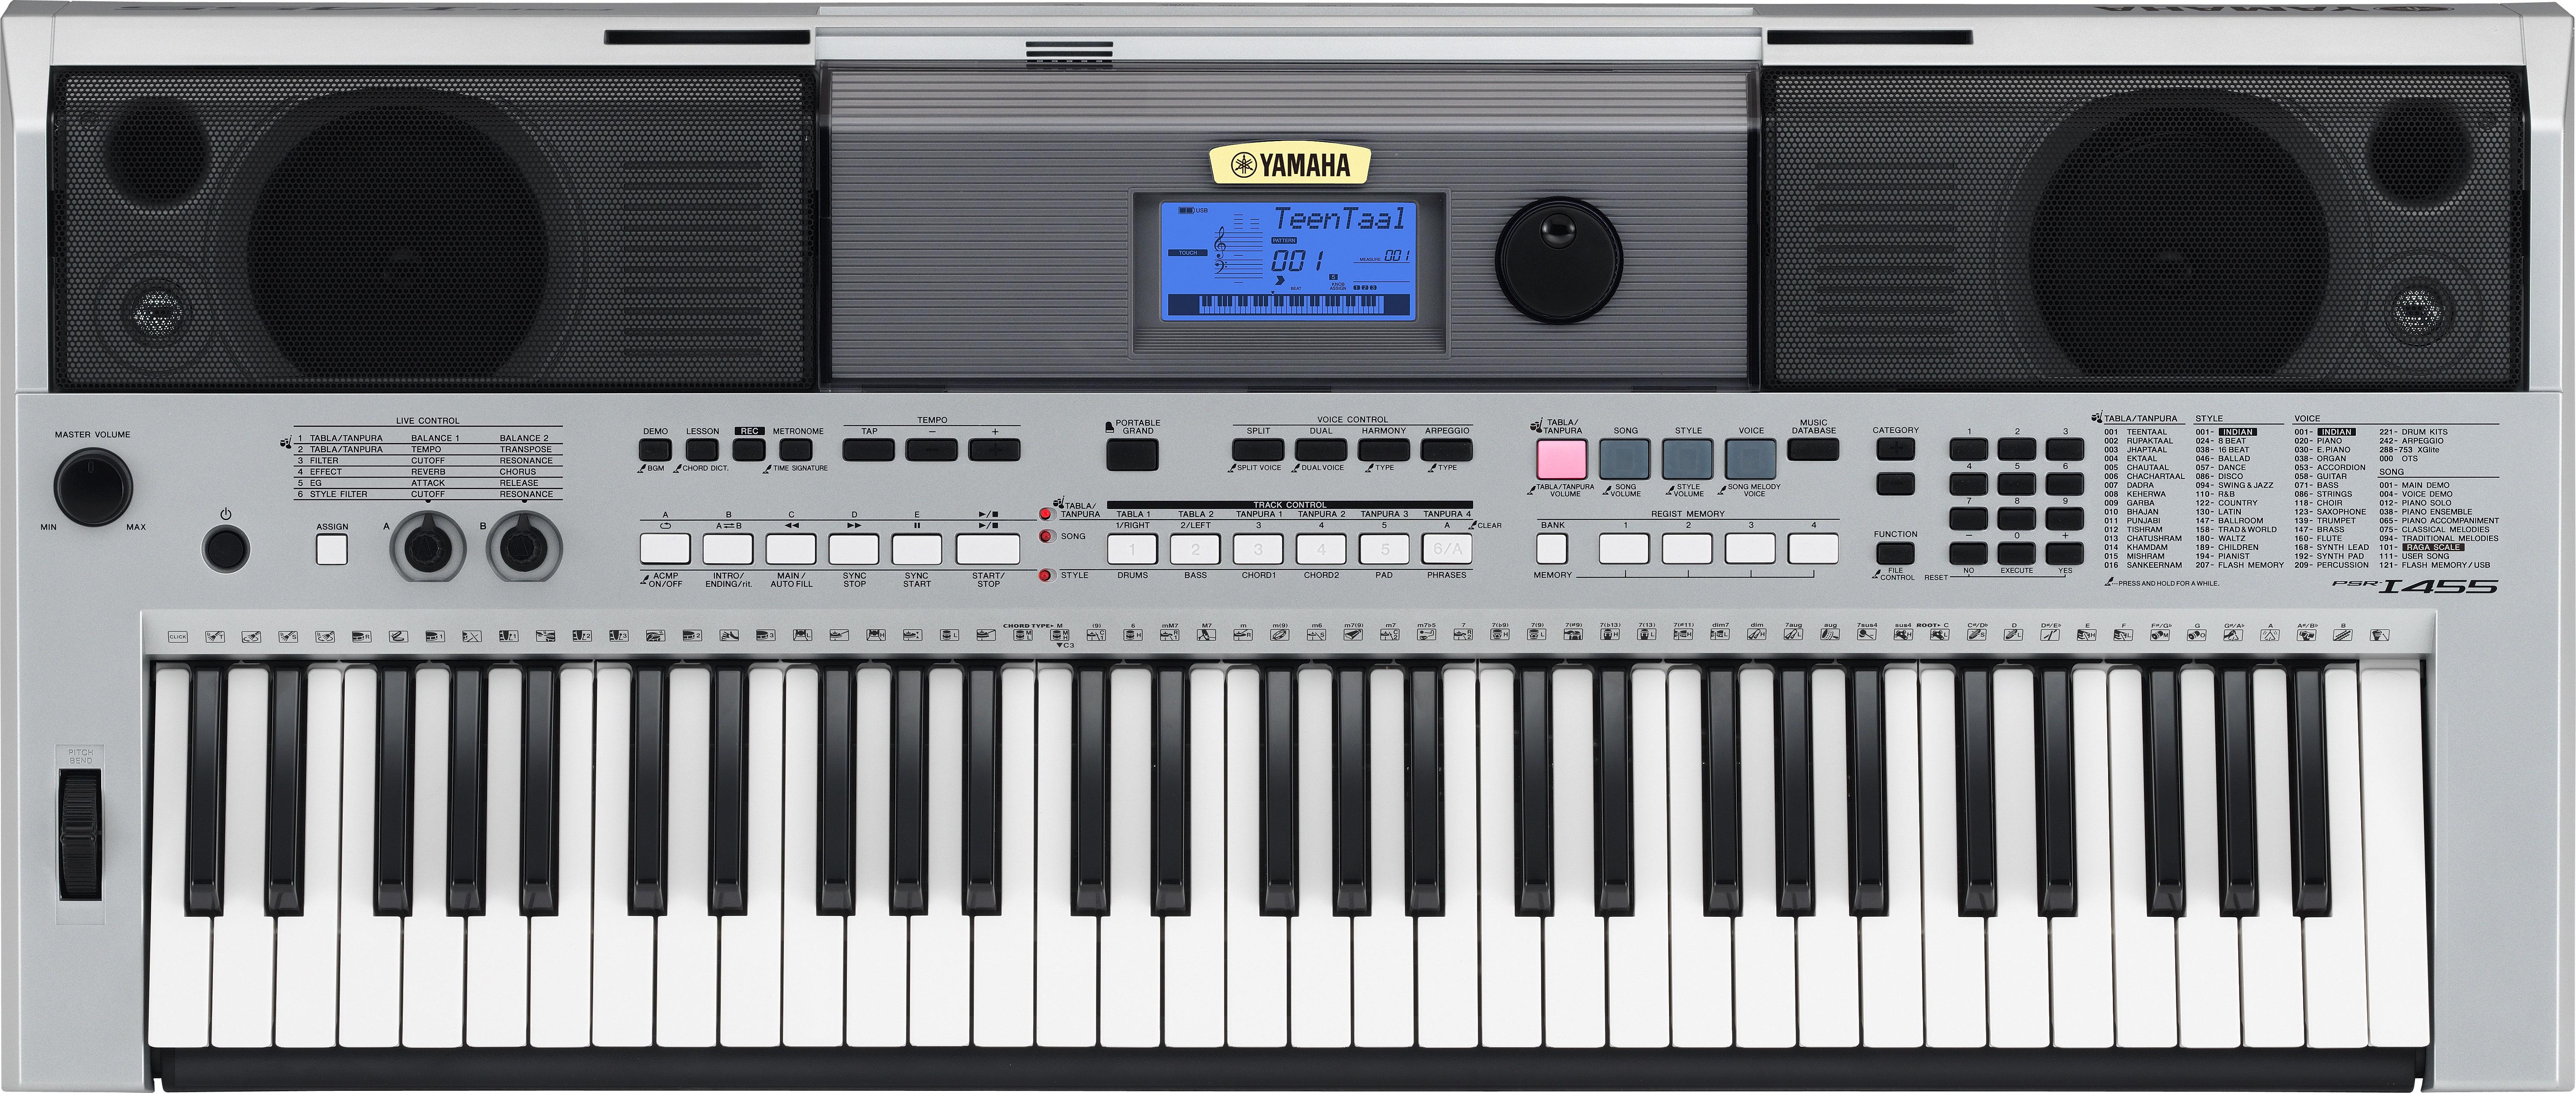 Yamaha psr i455 synthpedia for Yamaha cs1x keyboard